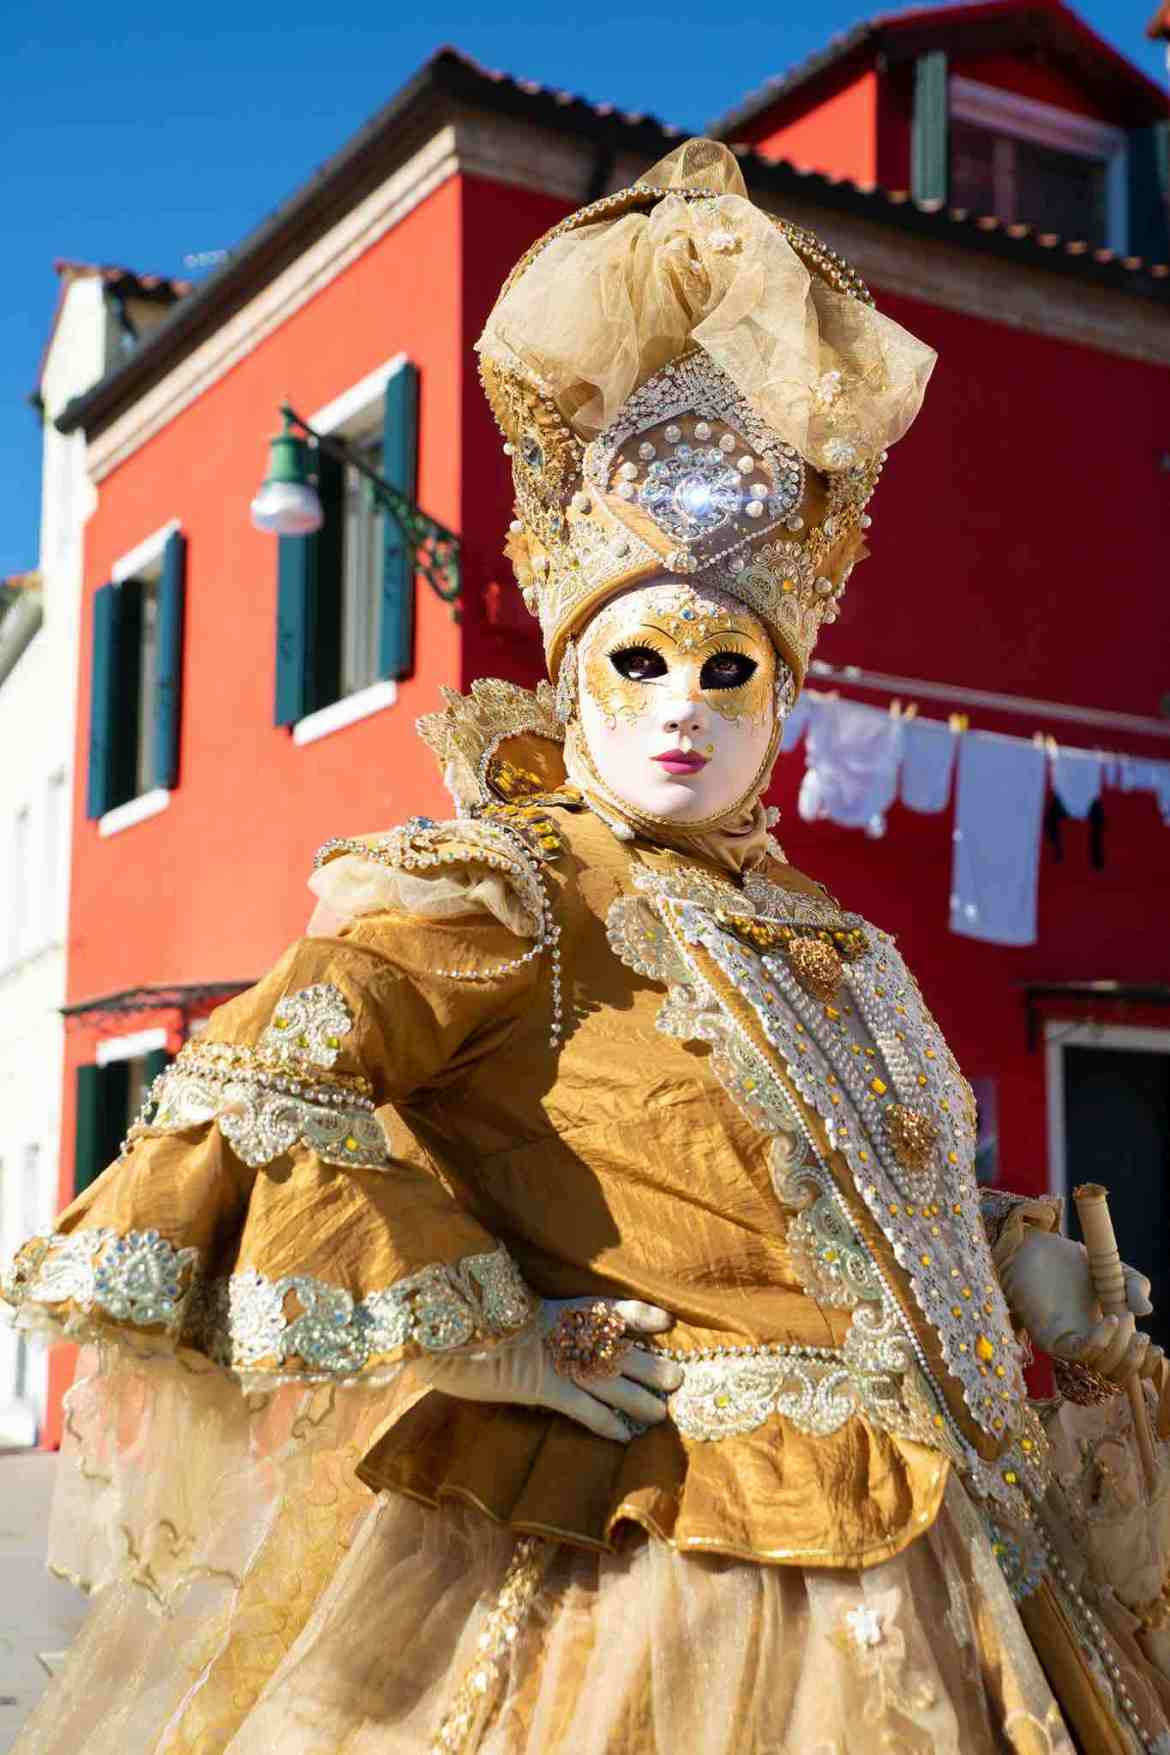 Burano and The Venice Carnival